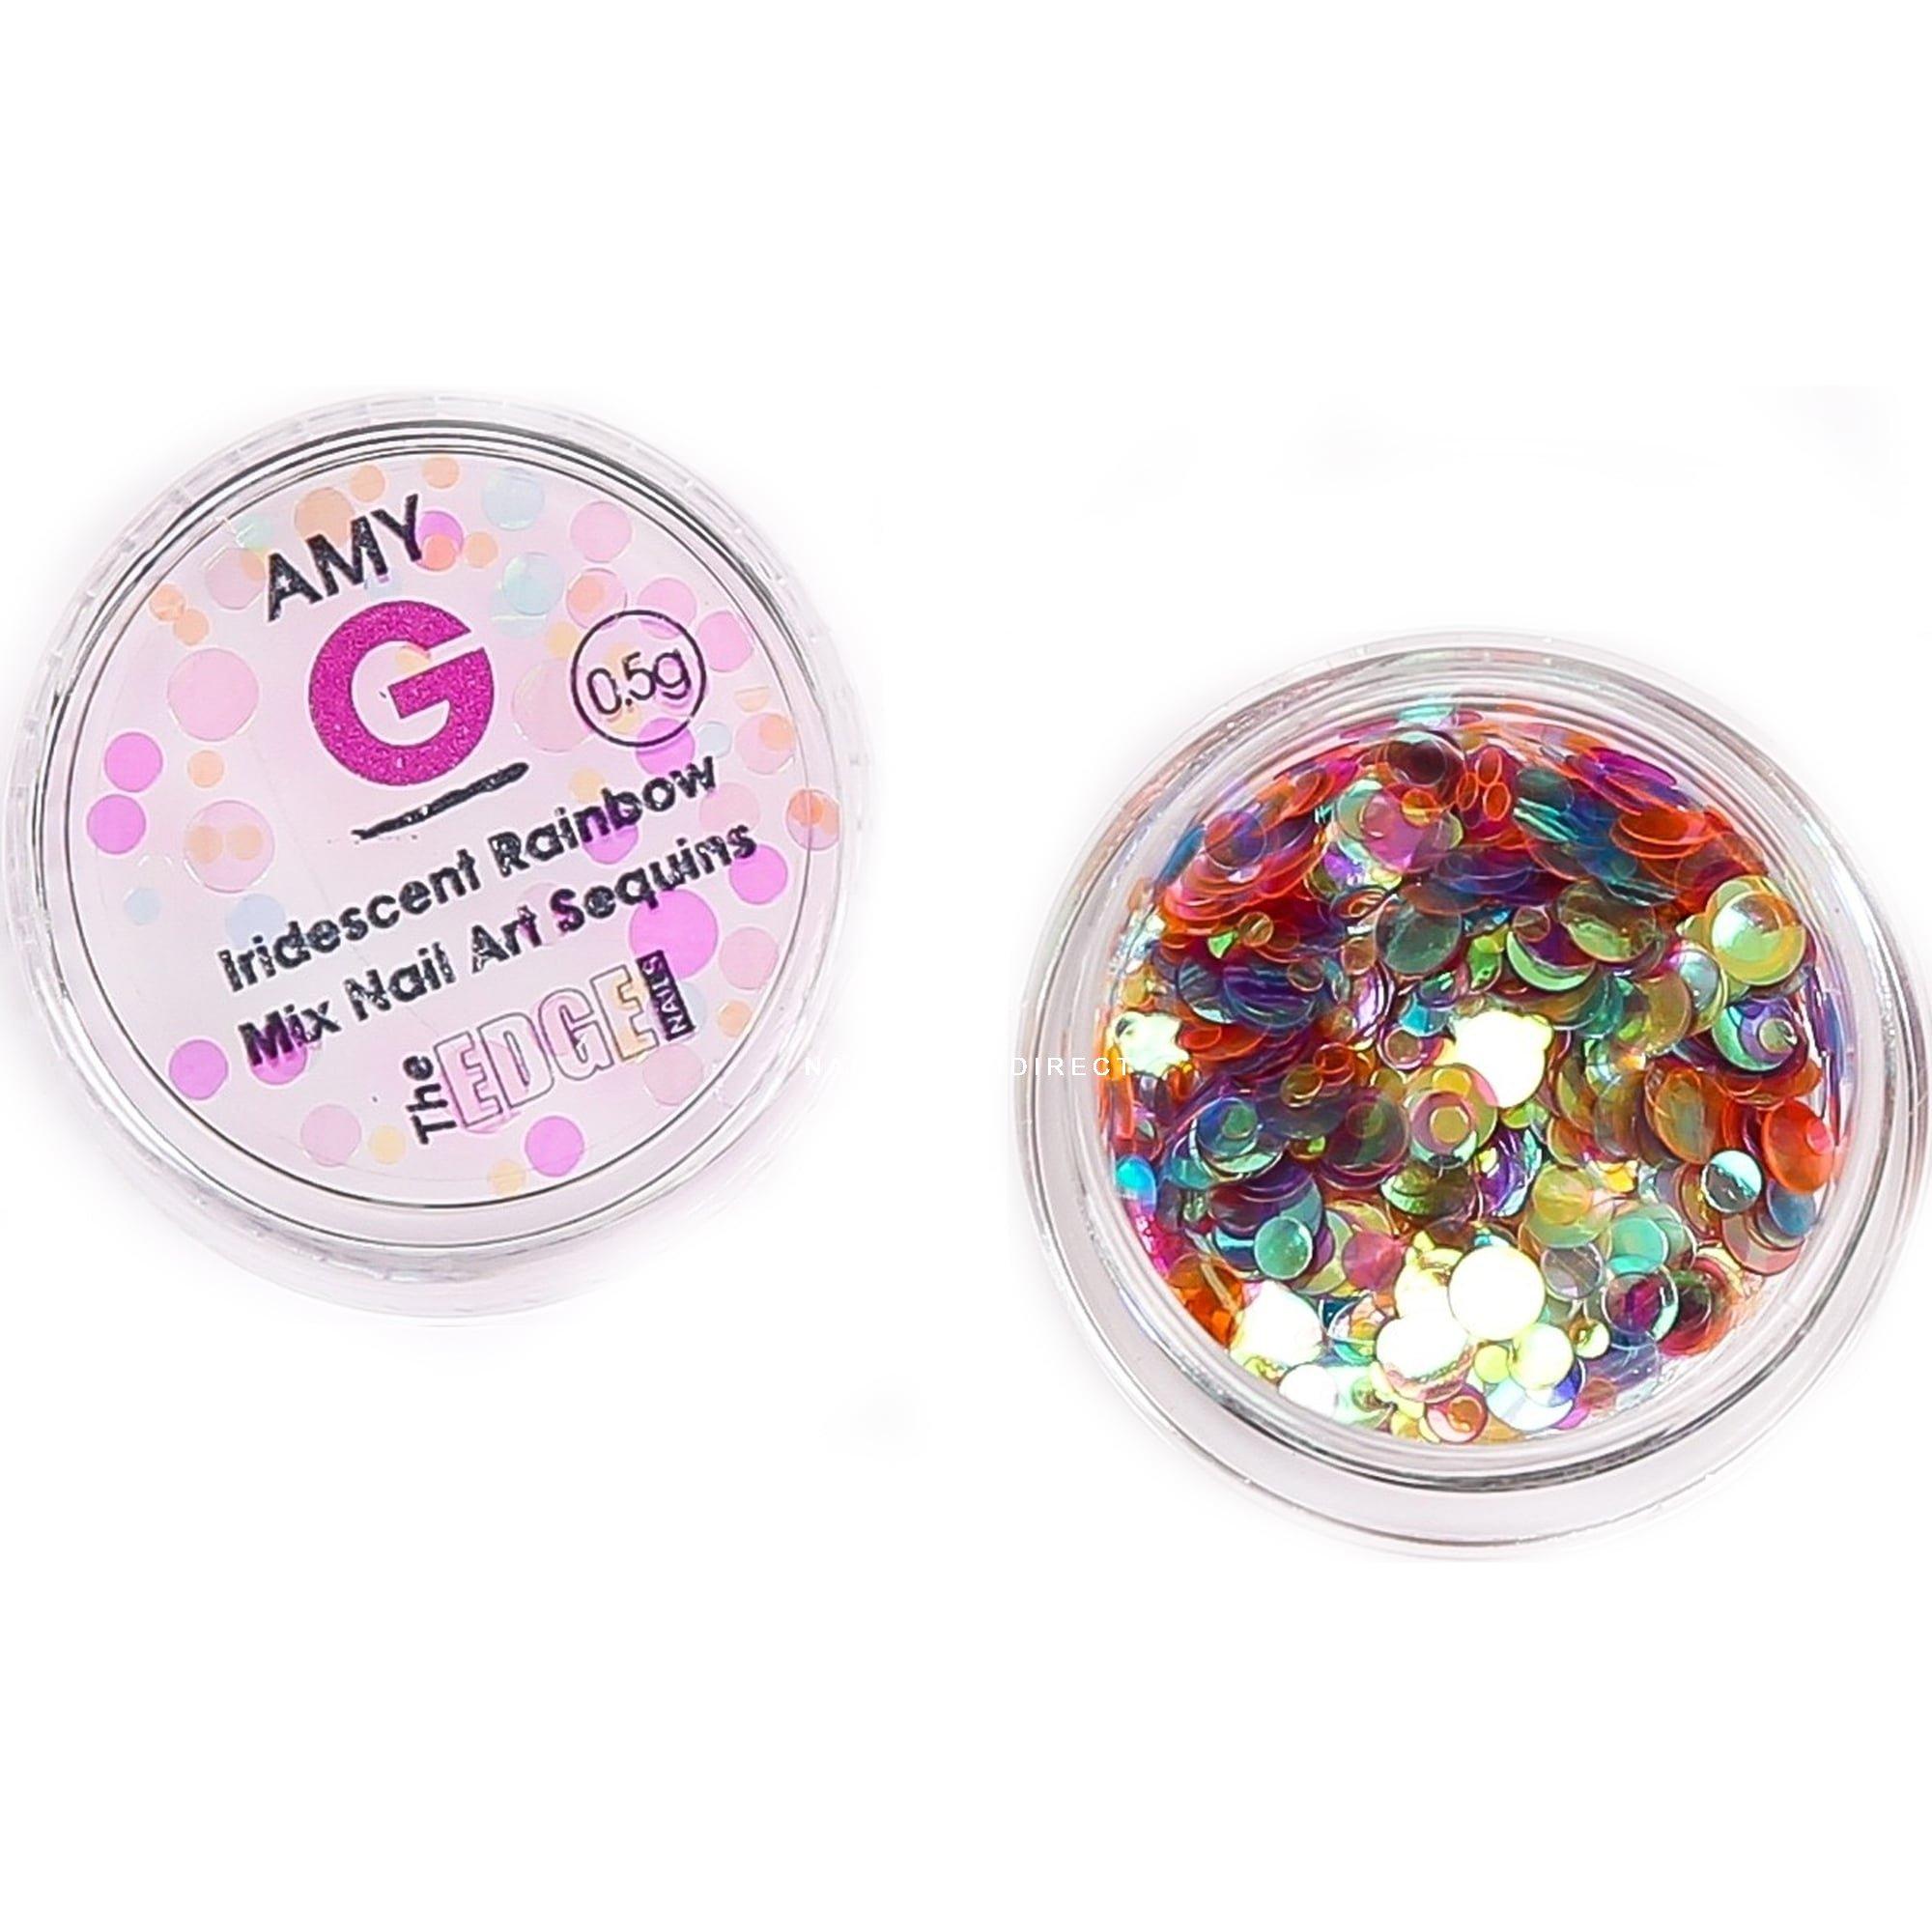 Amy G - Iridescent Nail Art Sequins - Rainbow 0 5g (3003069)